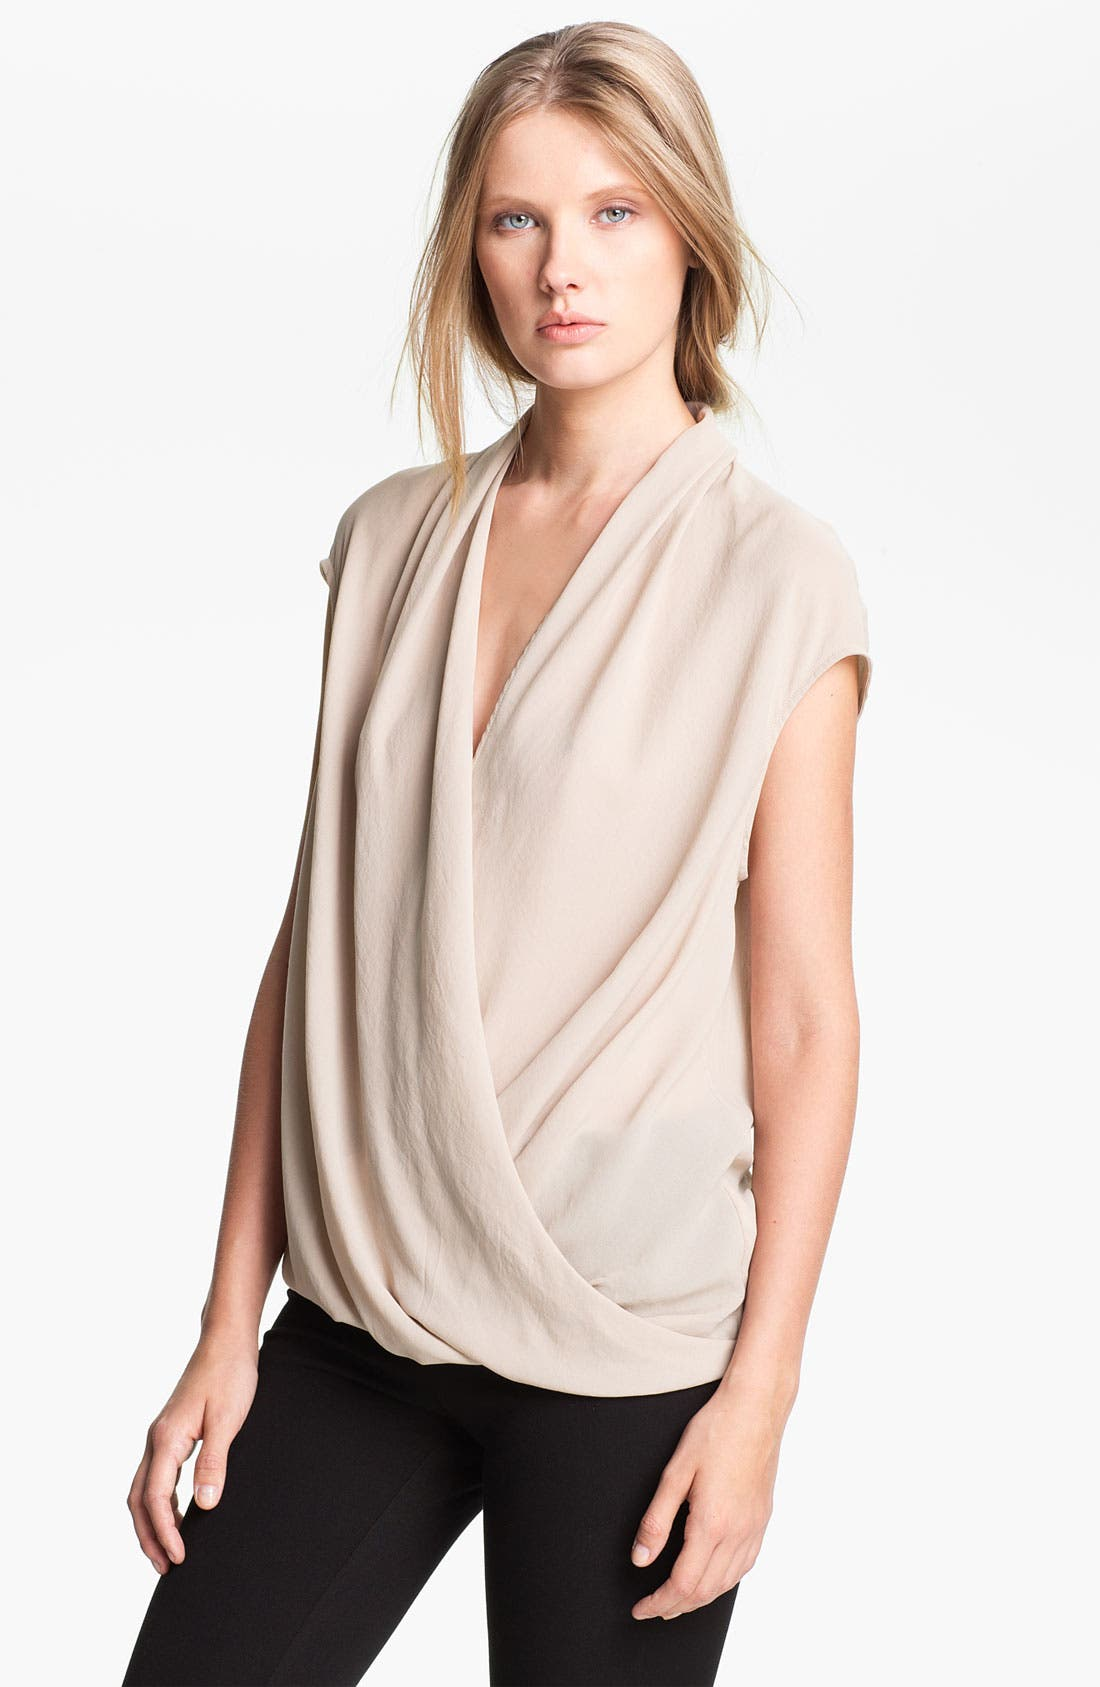 Alternate Image 1 Selected - Helmut Lang 'Soft Shroud' Twist Front Blouse